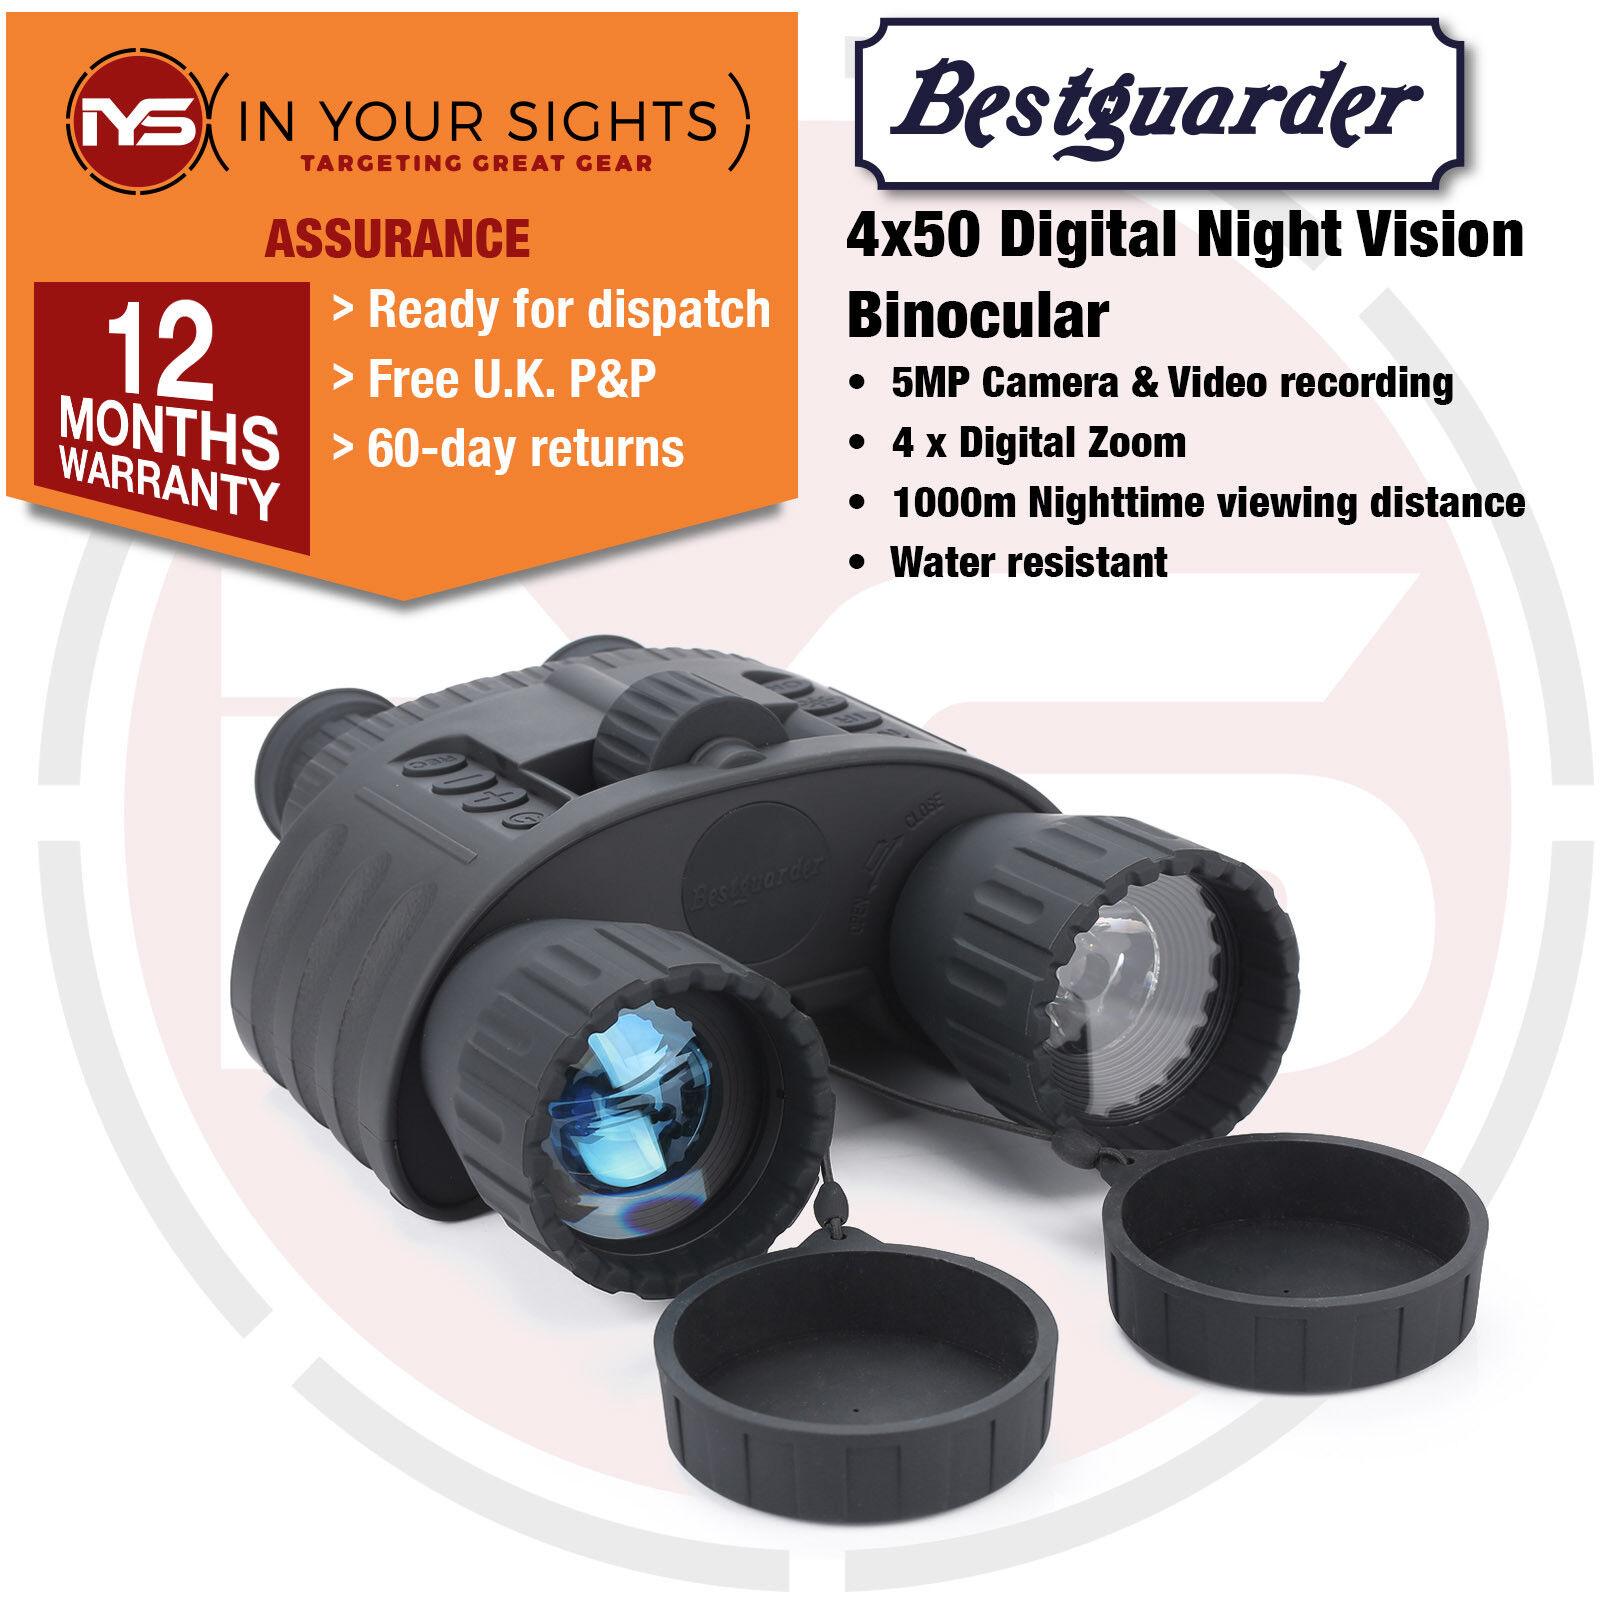 4-20x50 Digital Night Vision Binoculars   Night time surveillance binoculars